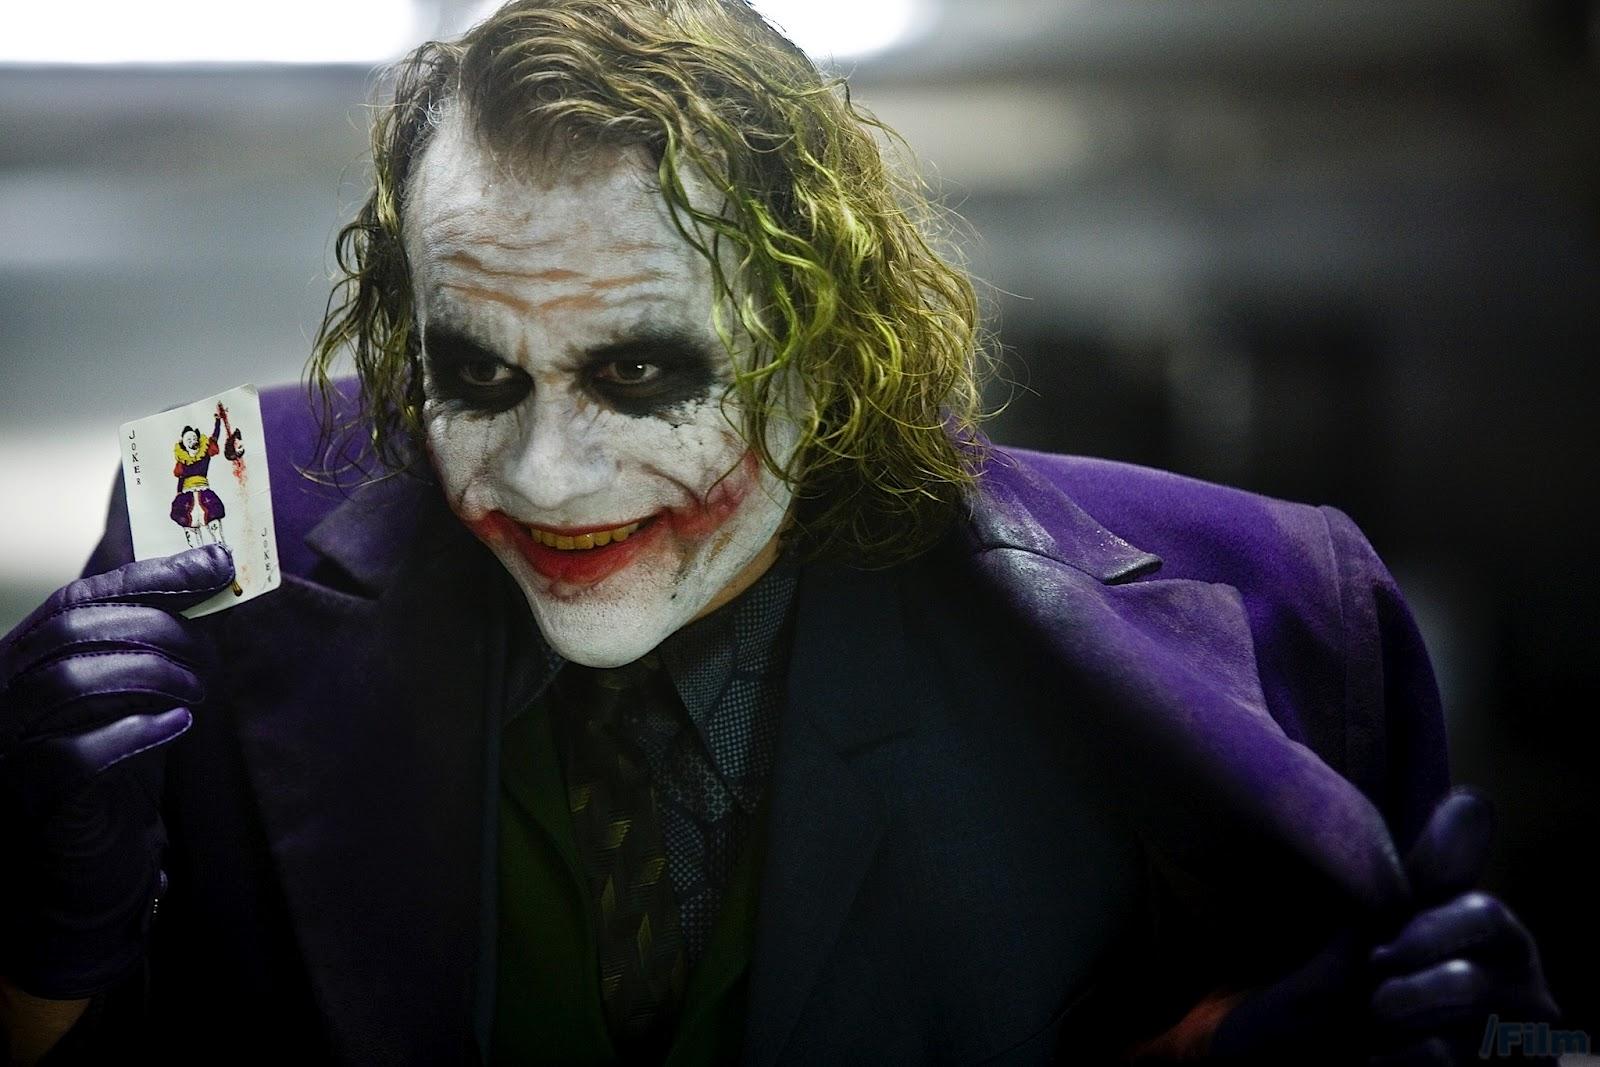 http://4.bp.blogspot.com/-sXV_MiVZ9mk/UCmQfPIwkOI/AAAAAAAAAF4/1k5eNxb6vdY/s1600/Joker-Heath-Ledger.jpg